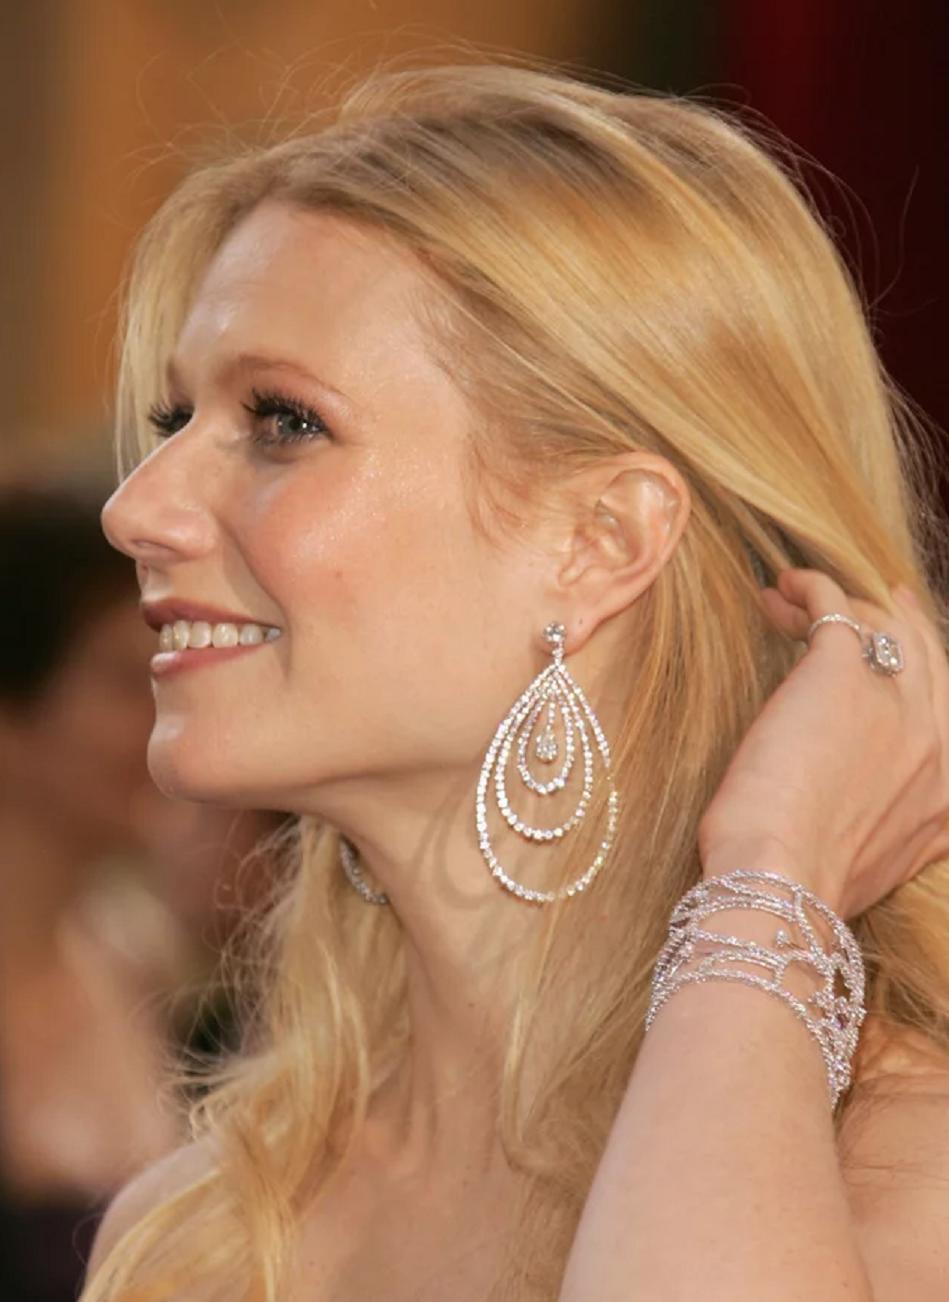 Amazing Hollywood celeb bling Gwyneth Paltrow Wearing Her Diamond Drop Earrings and Matching Diamond Cuff